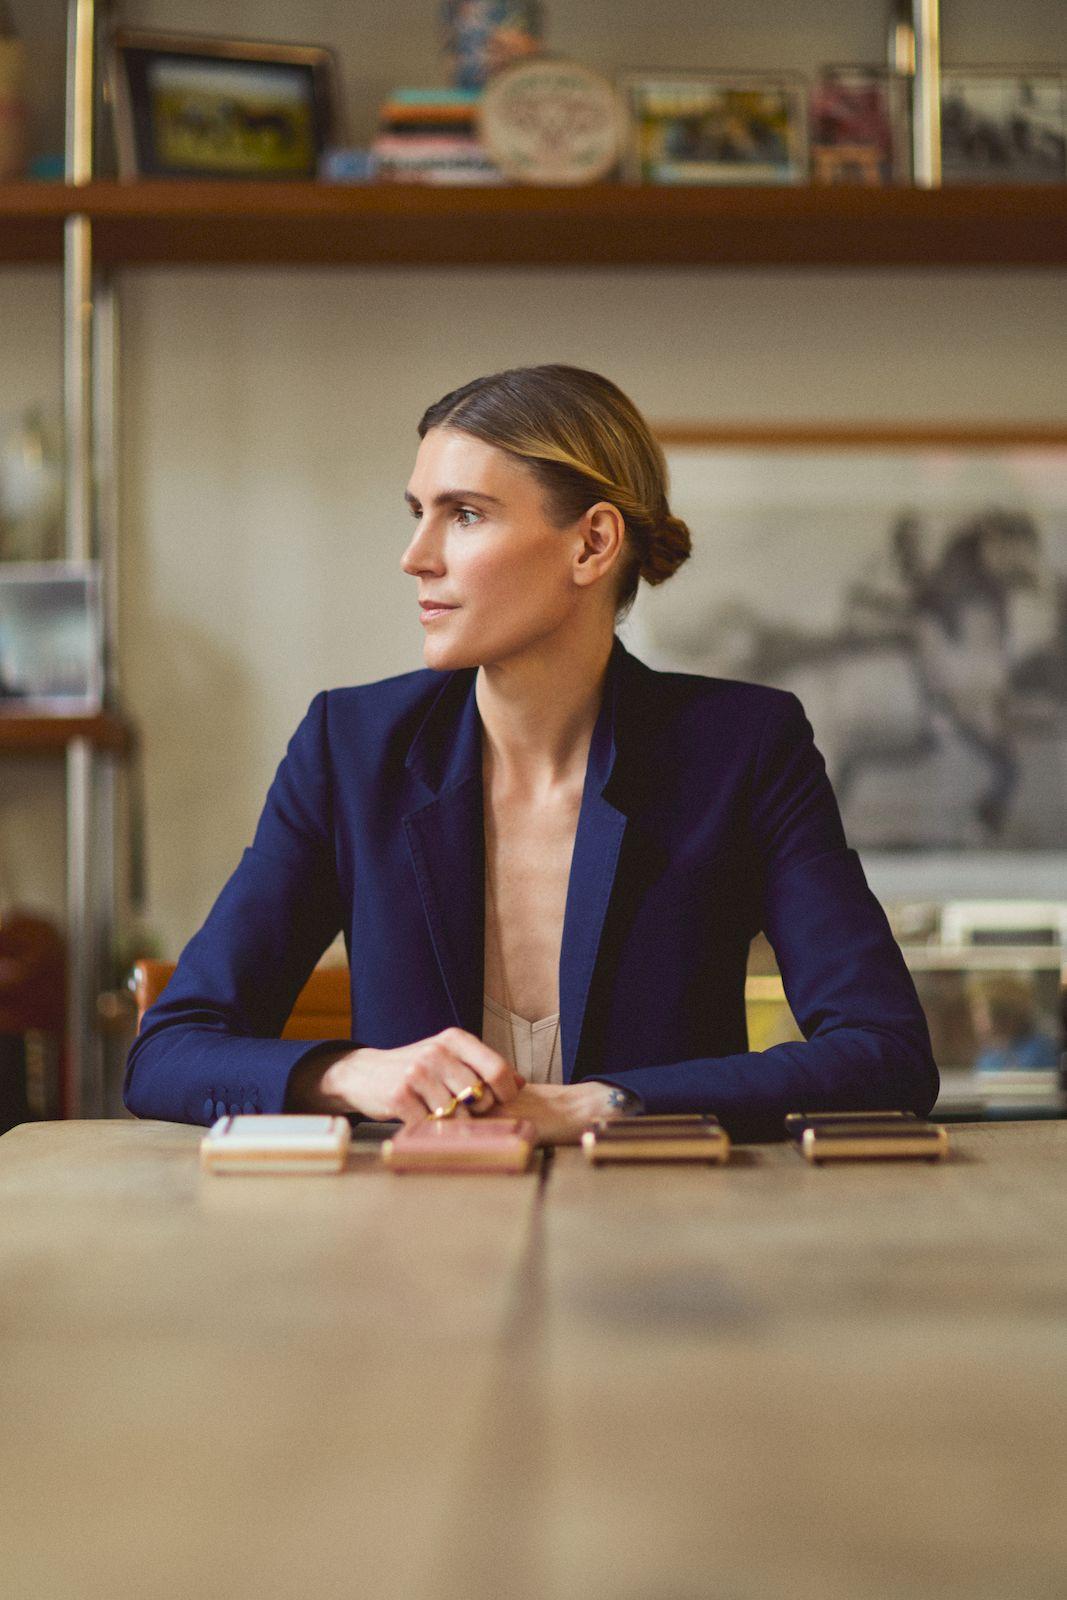 Interview with fashion designer Gabriela Hearts